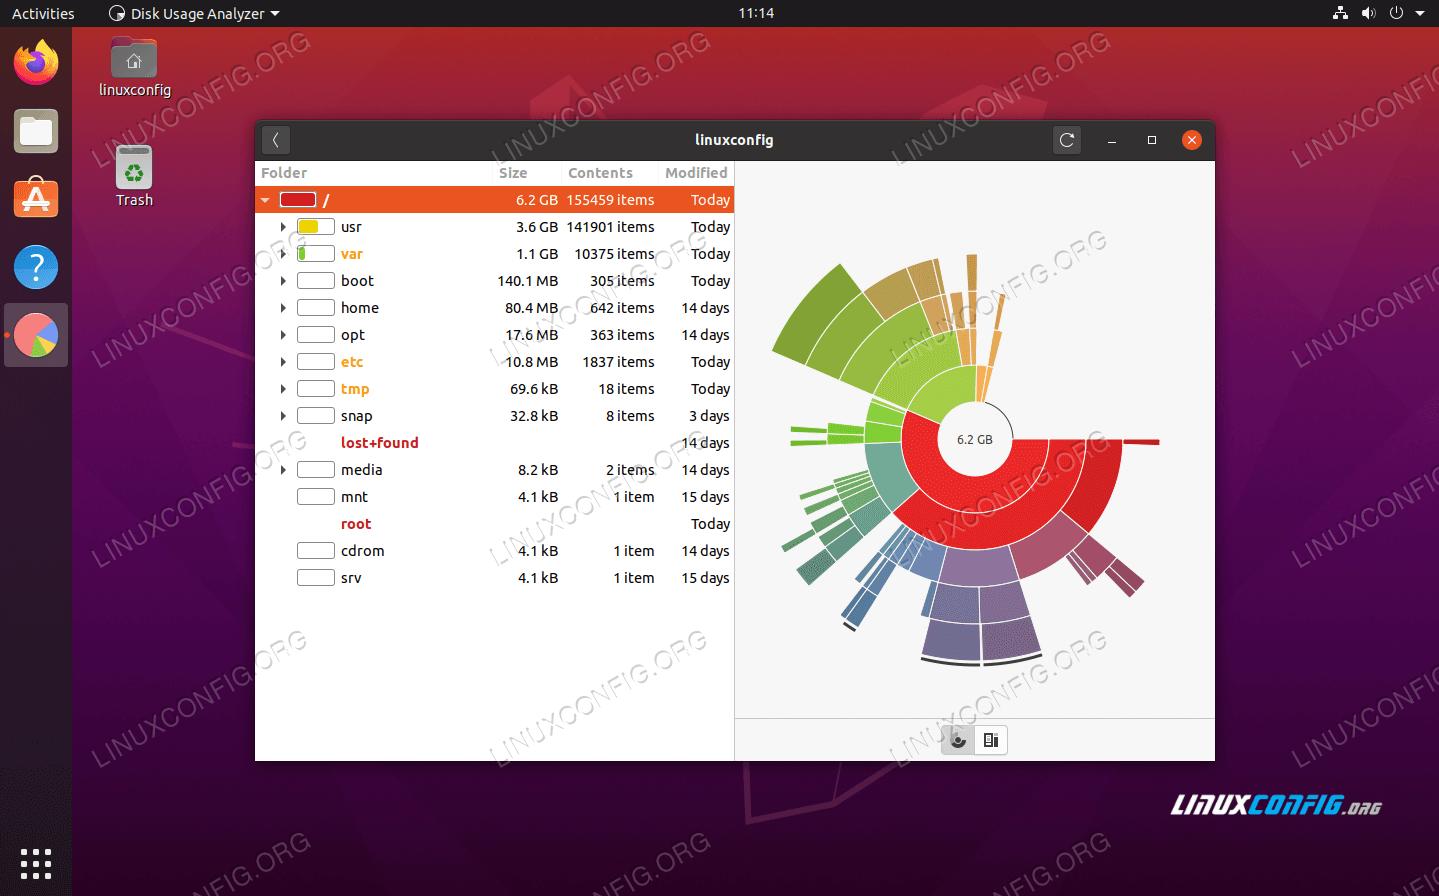 See storage usage on Ubuntu 20.04 Focal Fossa